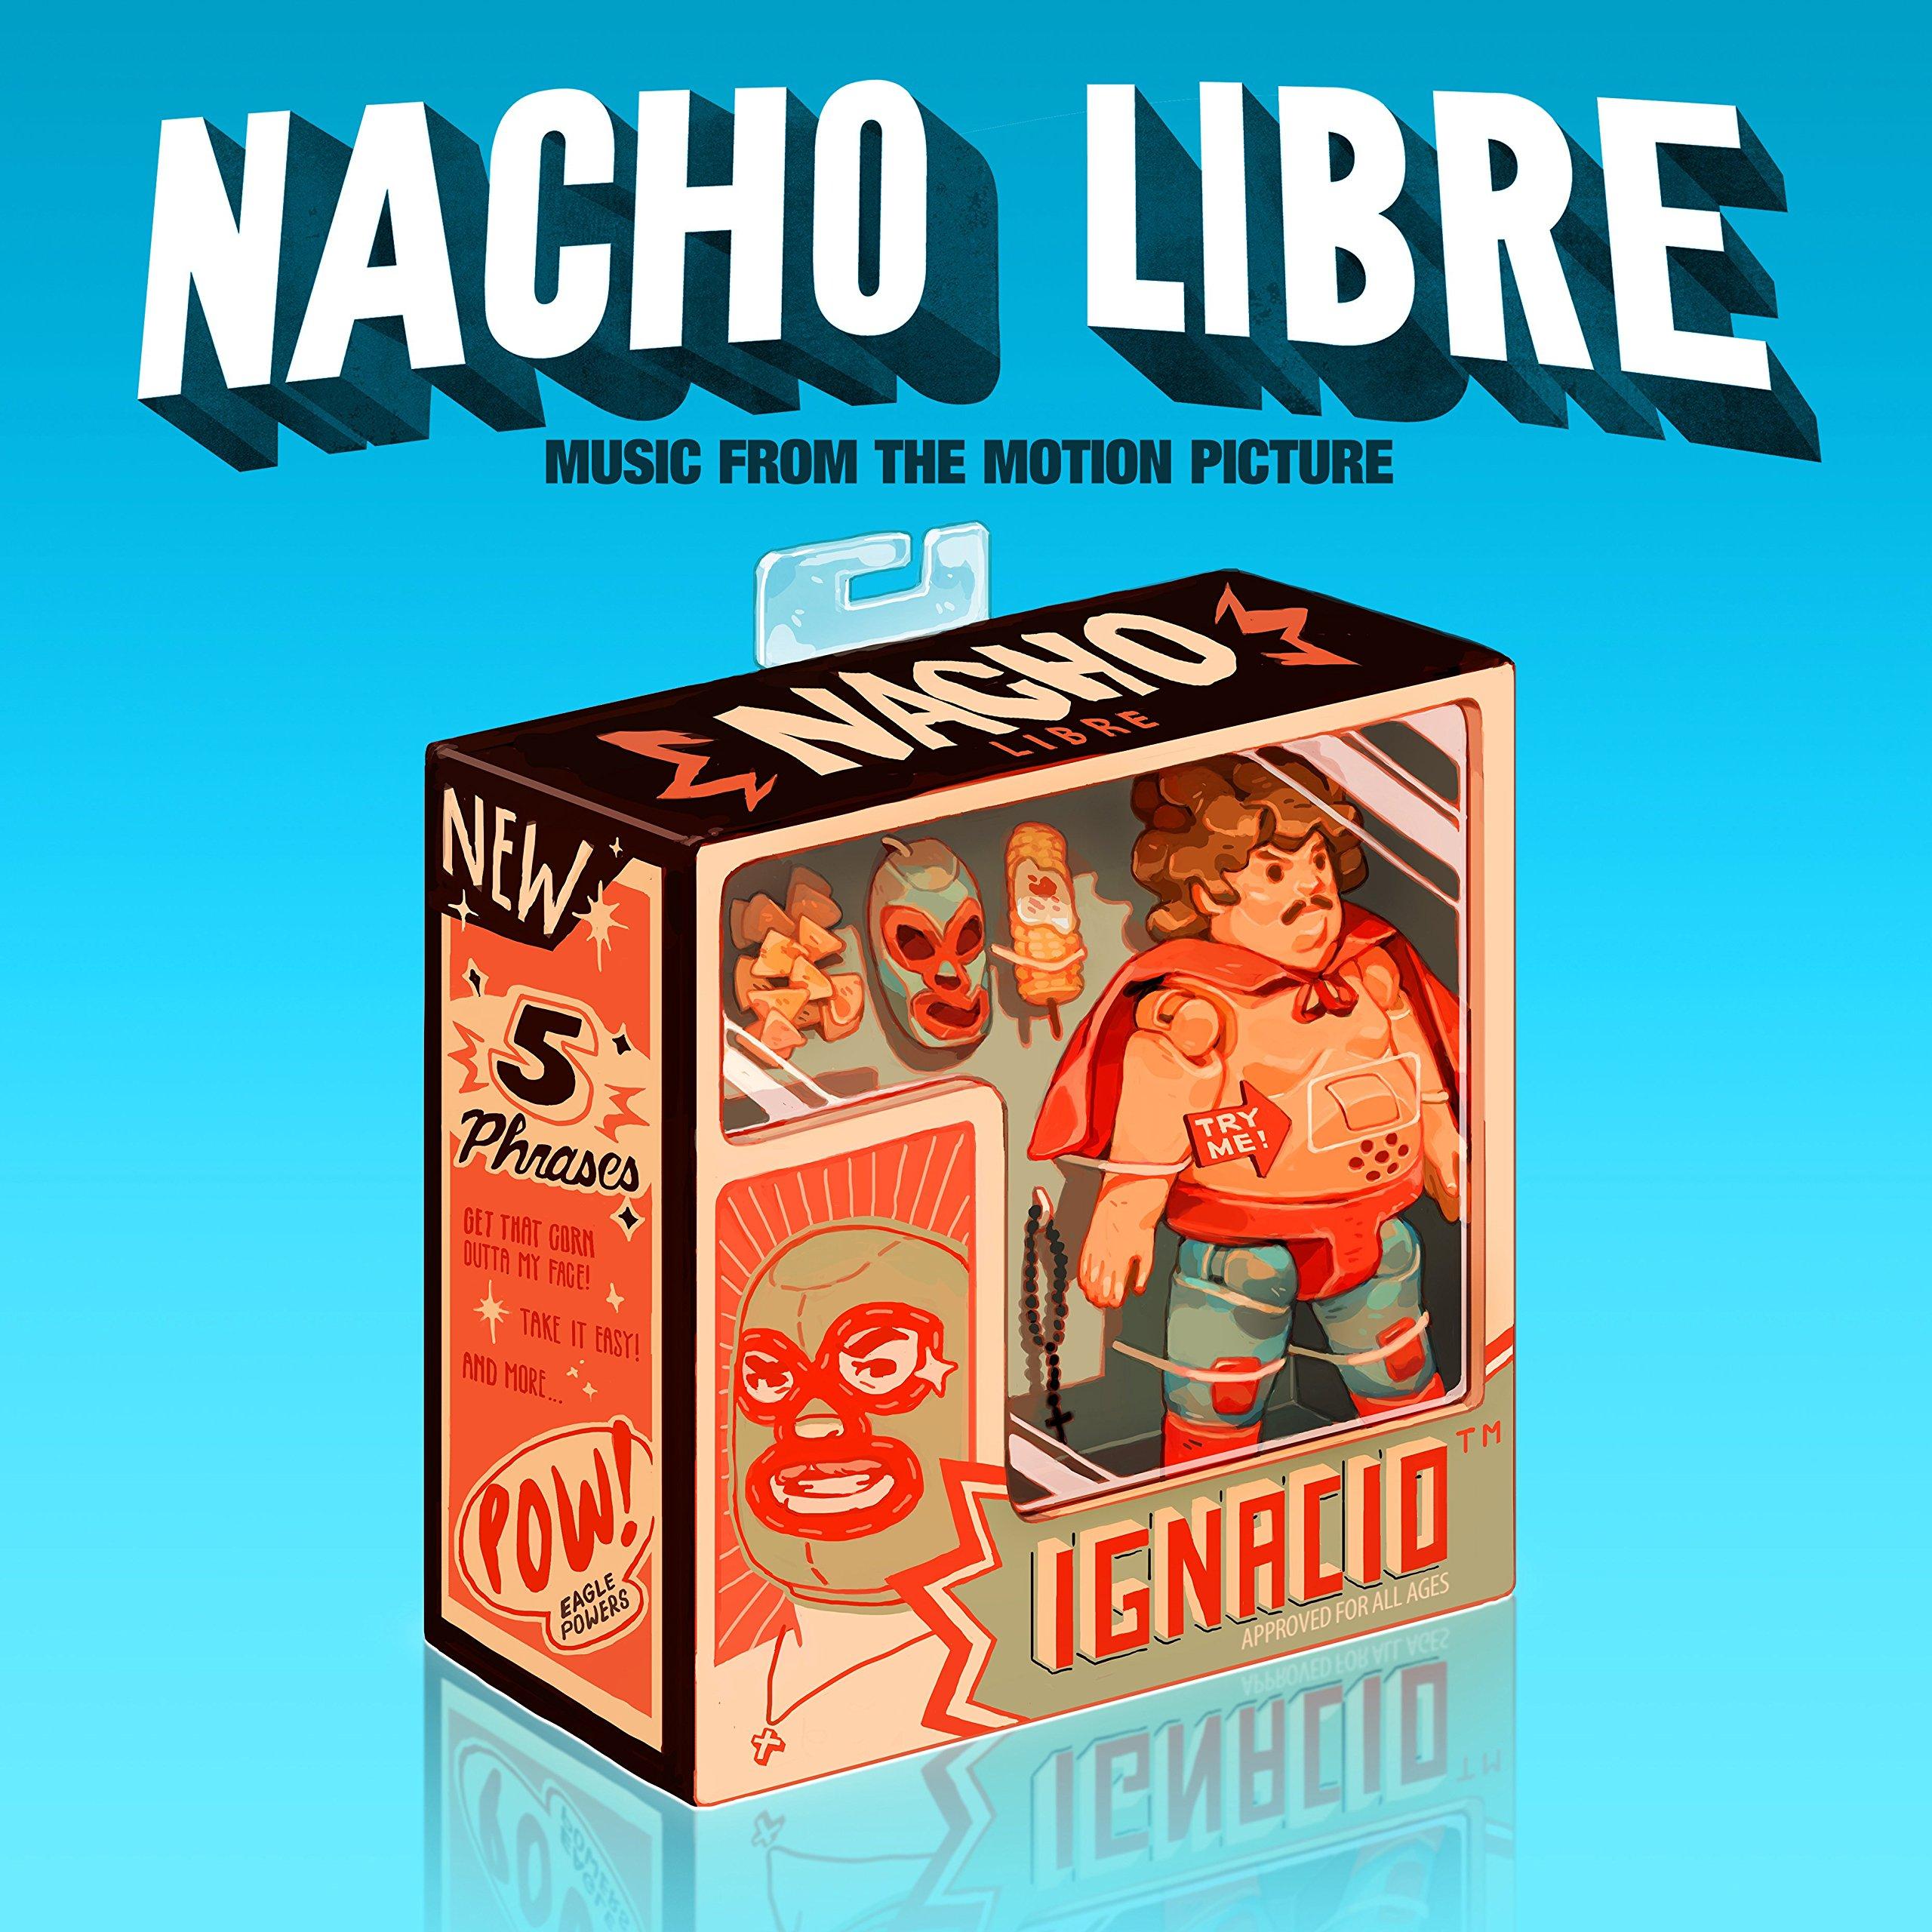 Vinilo : Soundtrack - Nacho Libre (Music from the Motion Picture) (Colored Vinyl, Blue, 2 Disc)